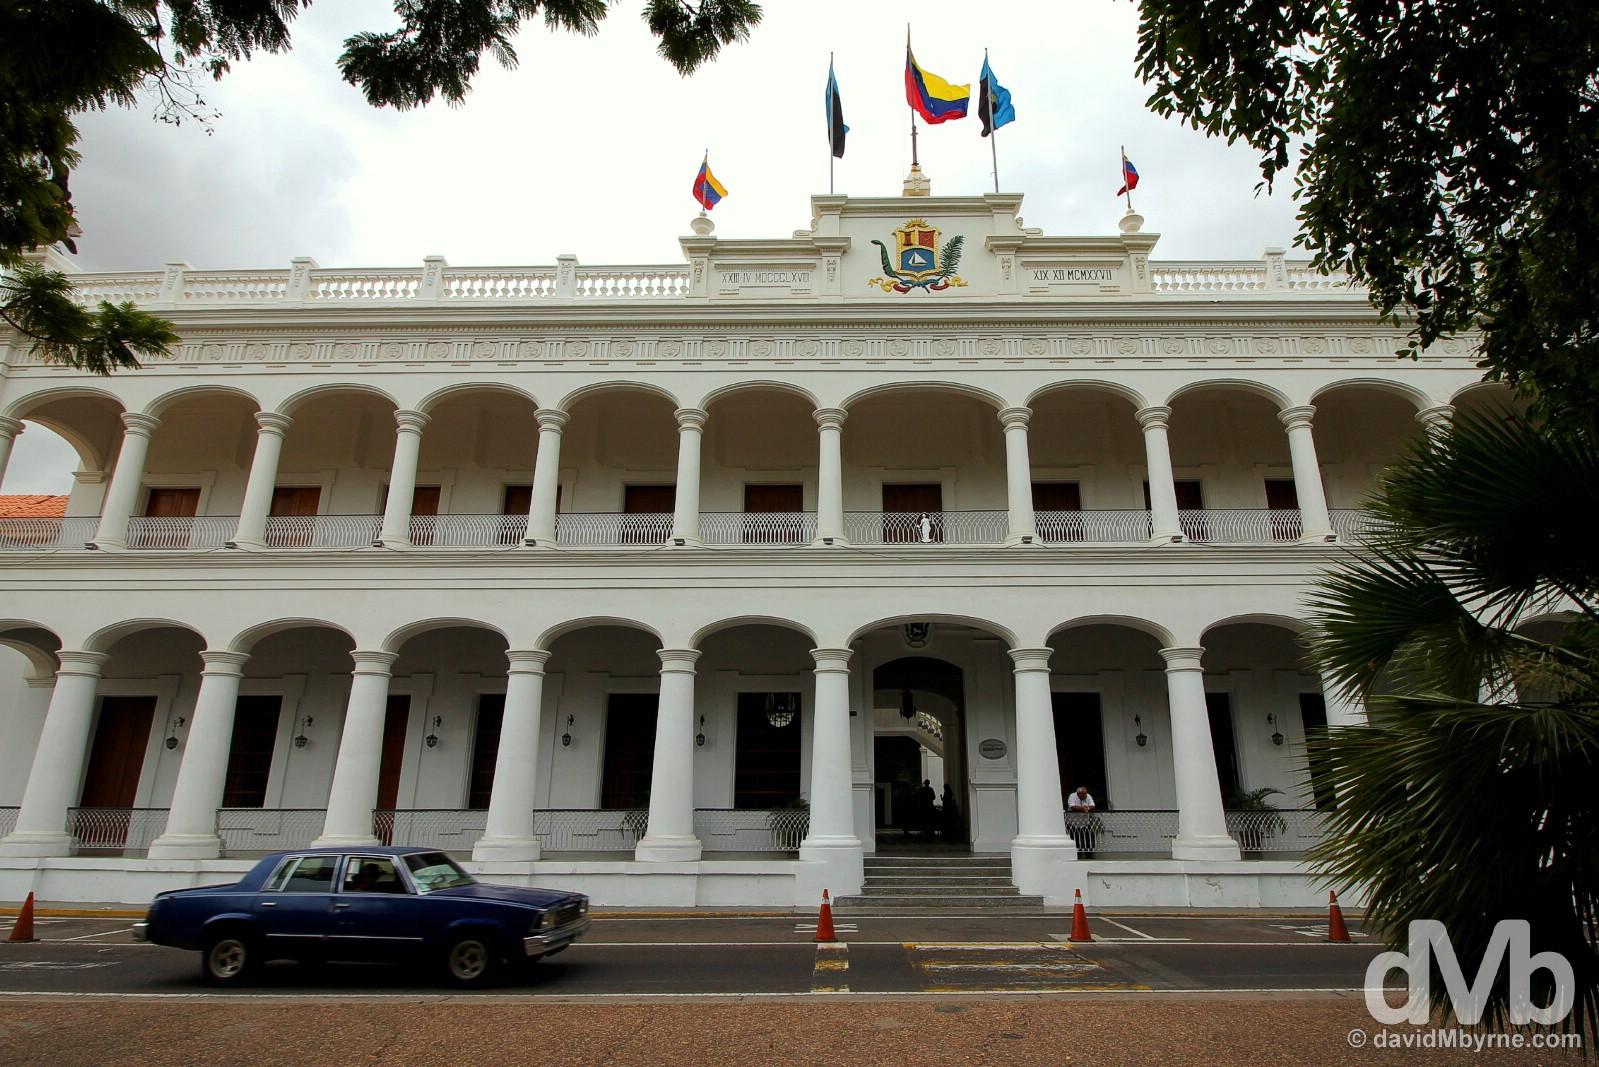 Government Palace in Plaza Bolivar, Maracaibo, Venezuela. June 22, 2015.